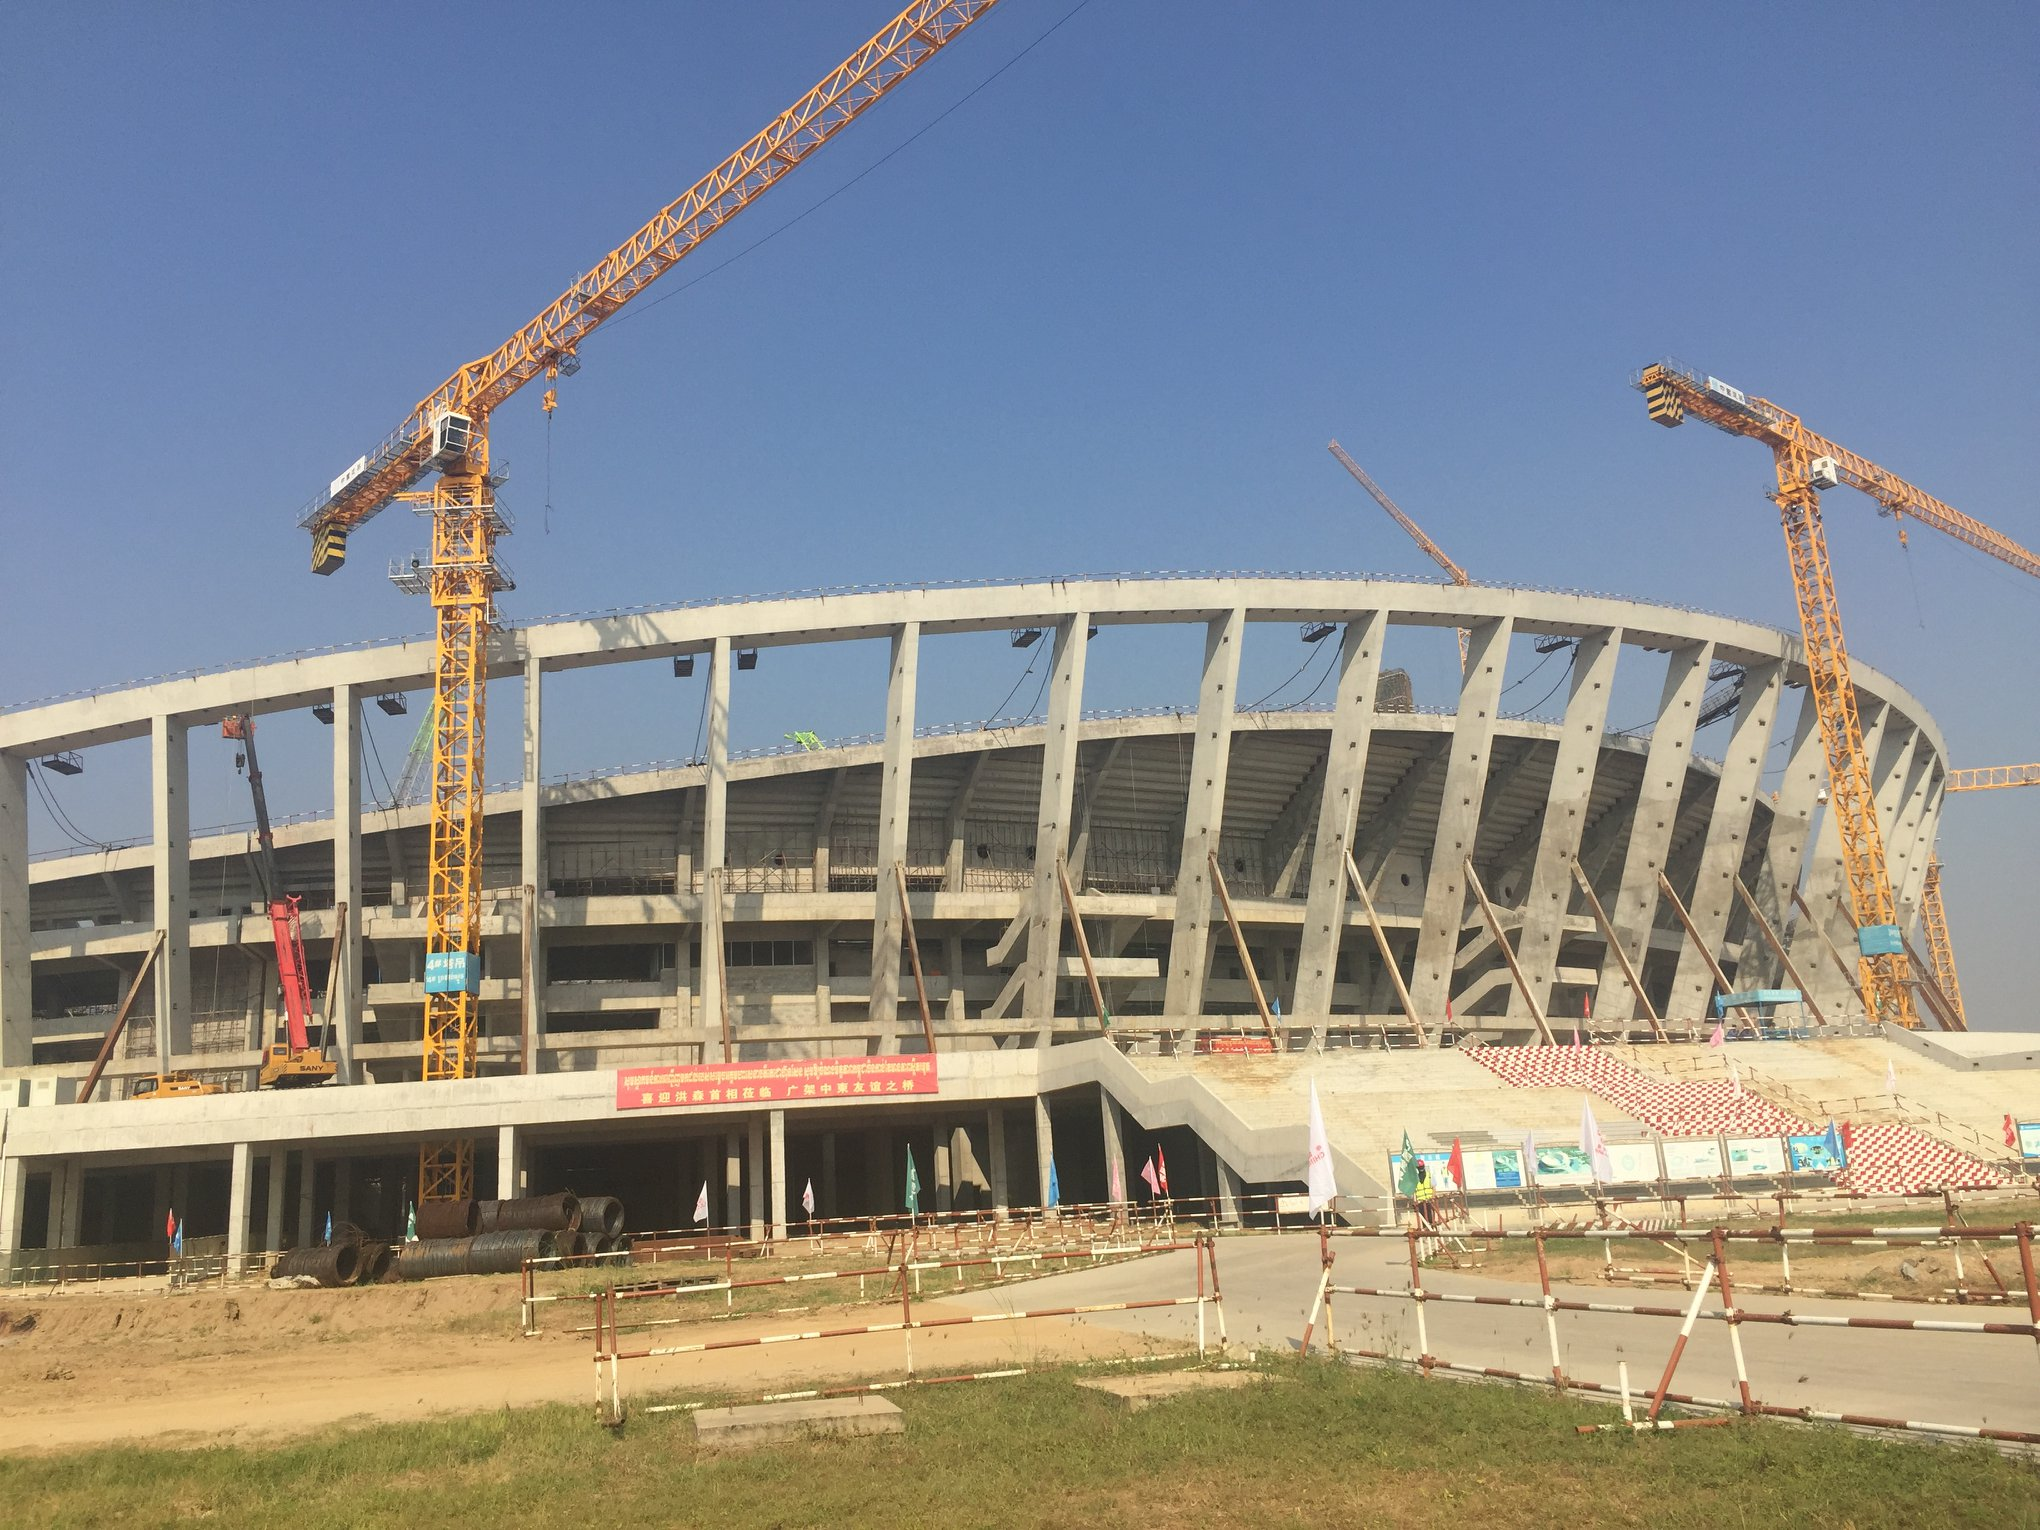 Morodok Techo Stadium